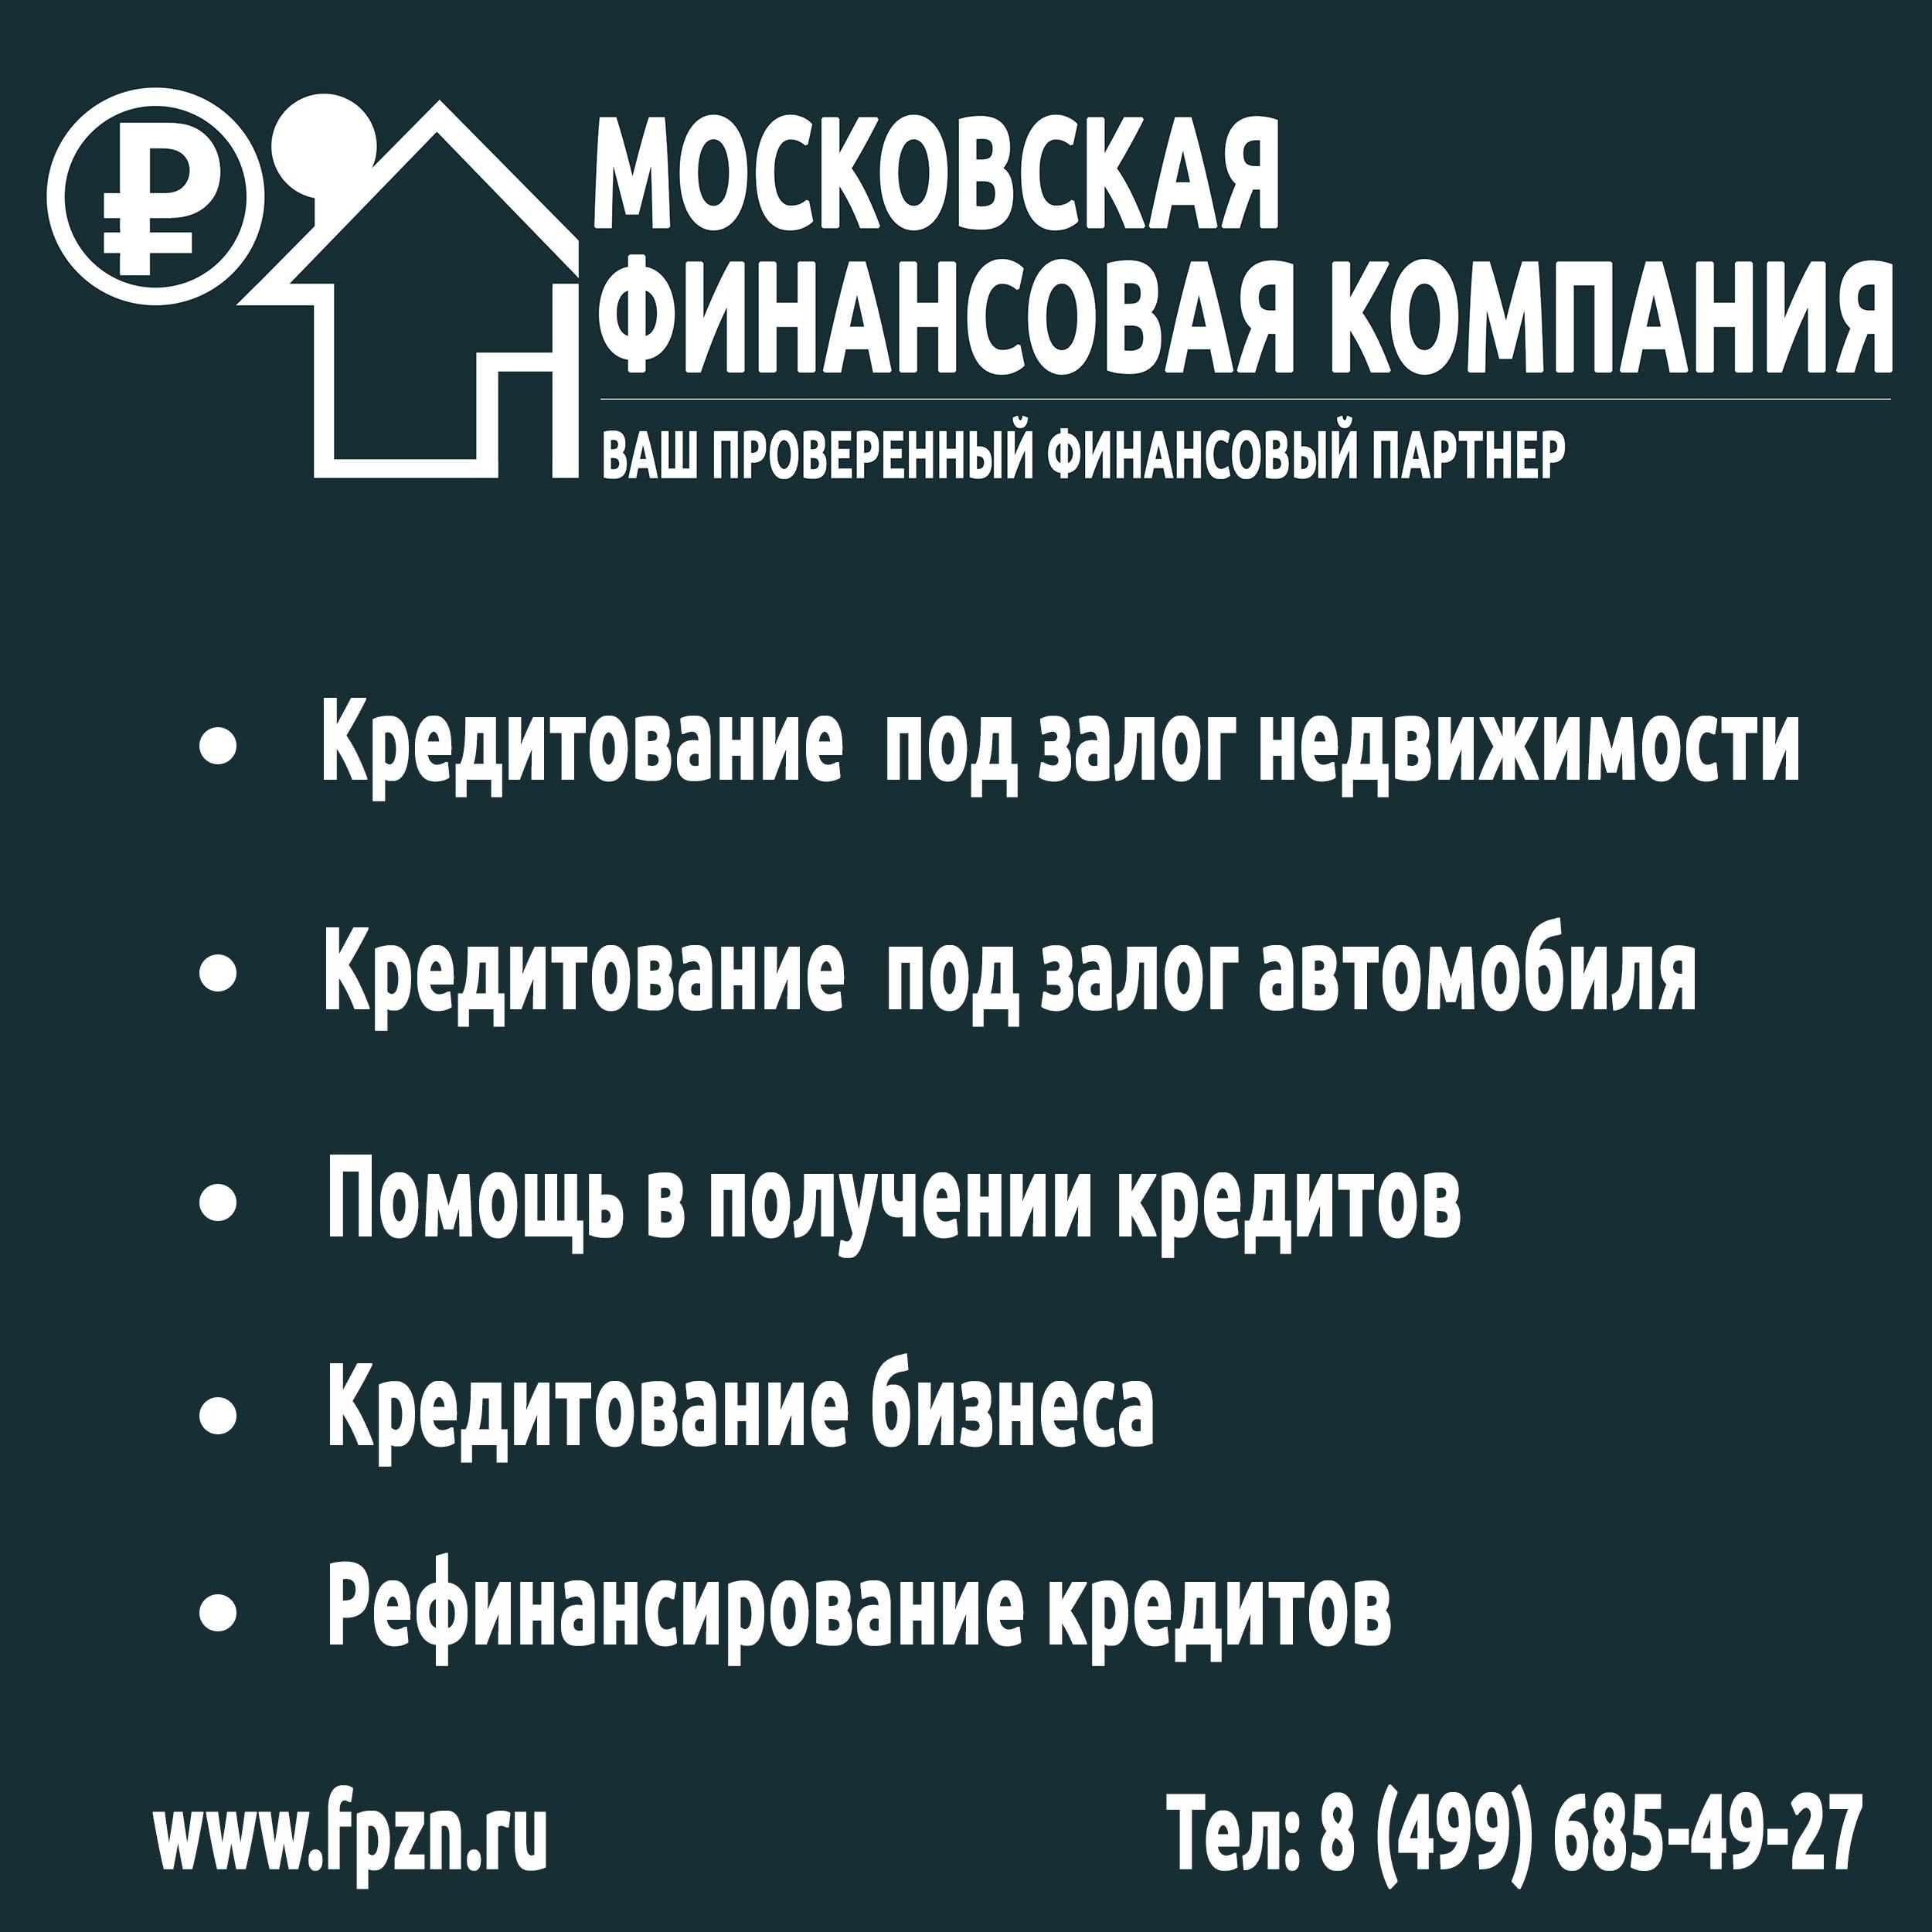 https://static-maps.yandex.ru/1.x/?ll\u003d38.97502600,45.04567300\u0026z\u003d16\u0026l\u003dmap\u0026size\u003d160,160\u0026pt\u003d38.97502600,45.04567300,pm2rdm